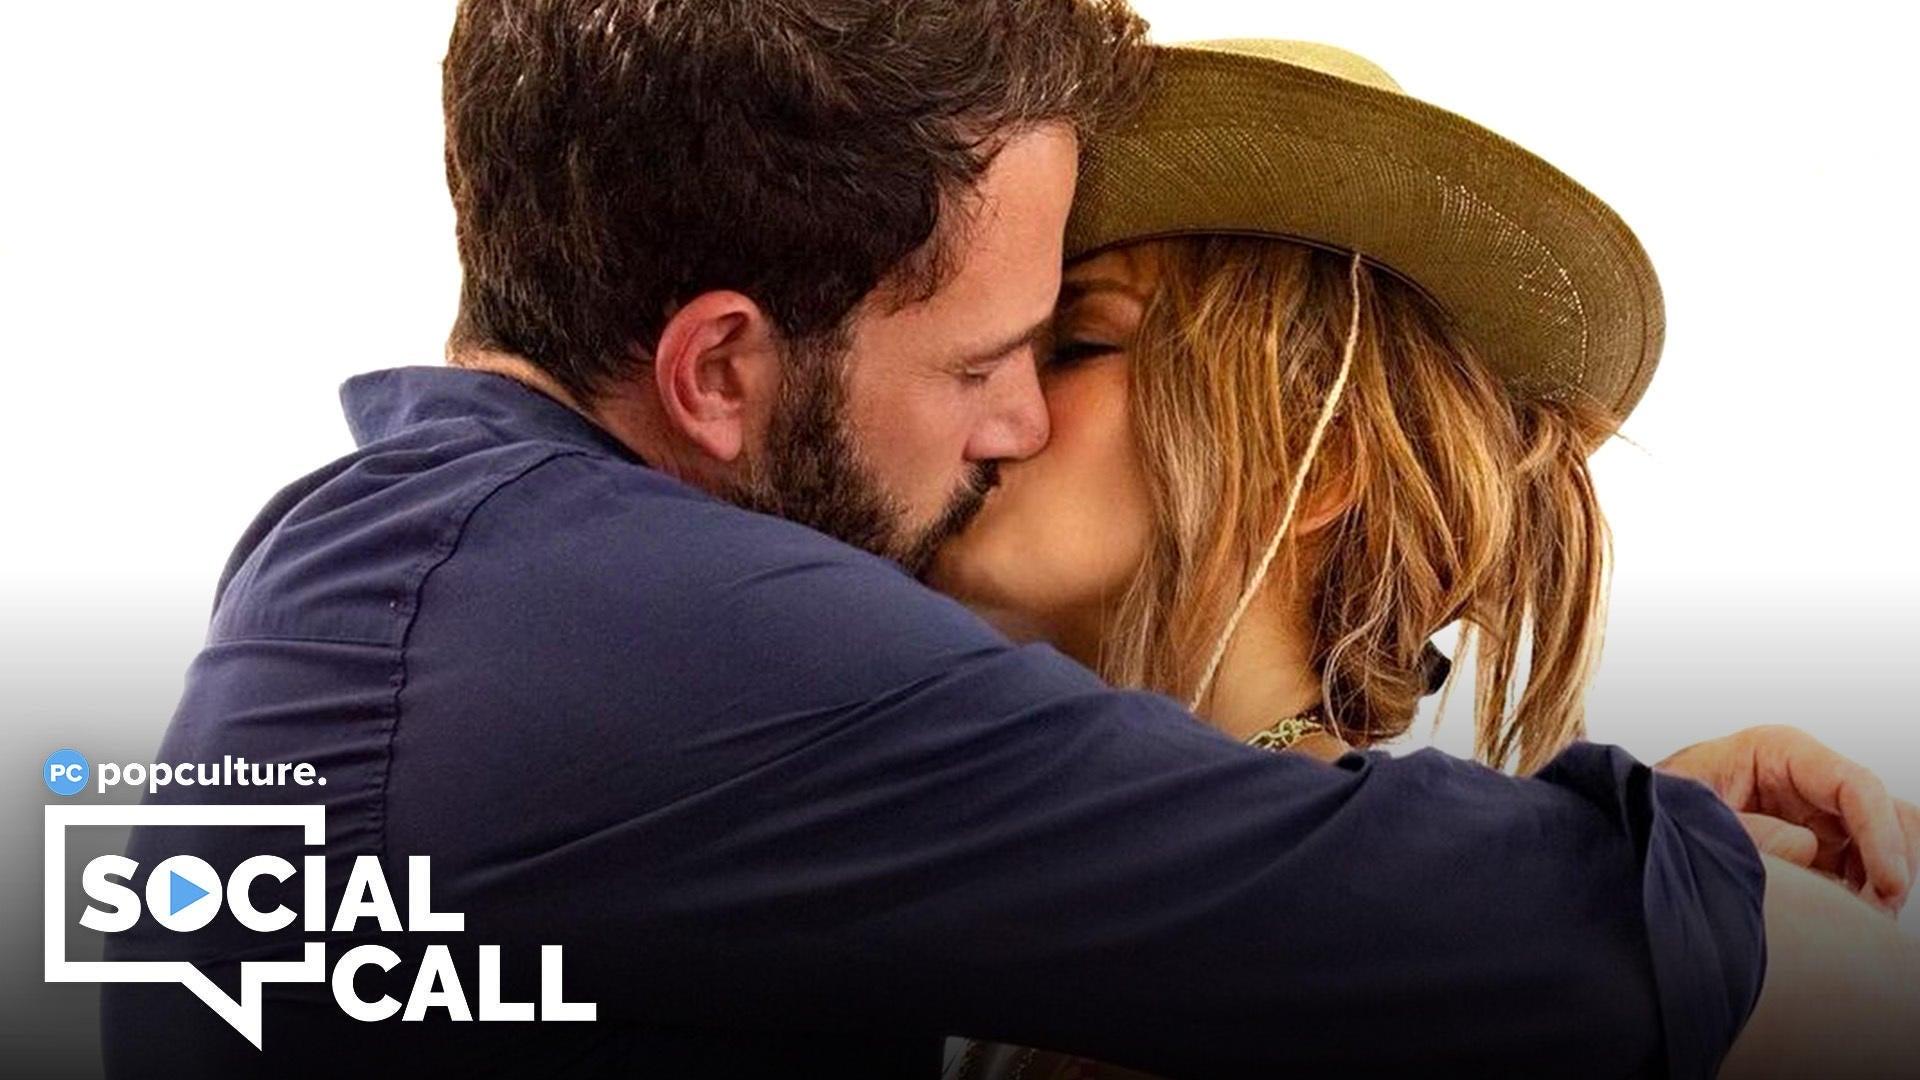 Popculture Social Call - Jennifer Lopez and Ben Affleck Take Major Relationship Step After Reuniting